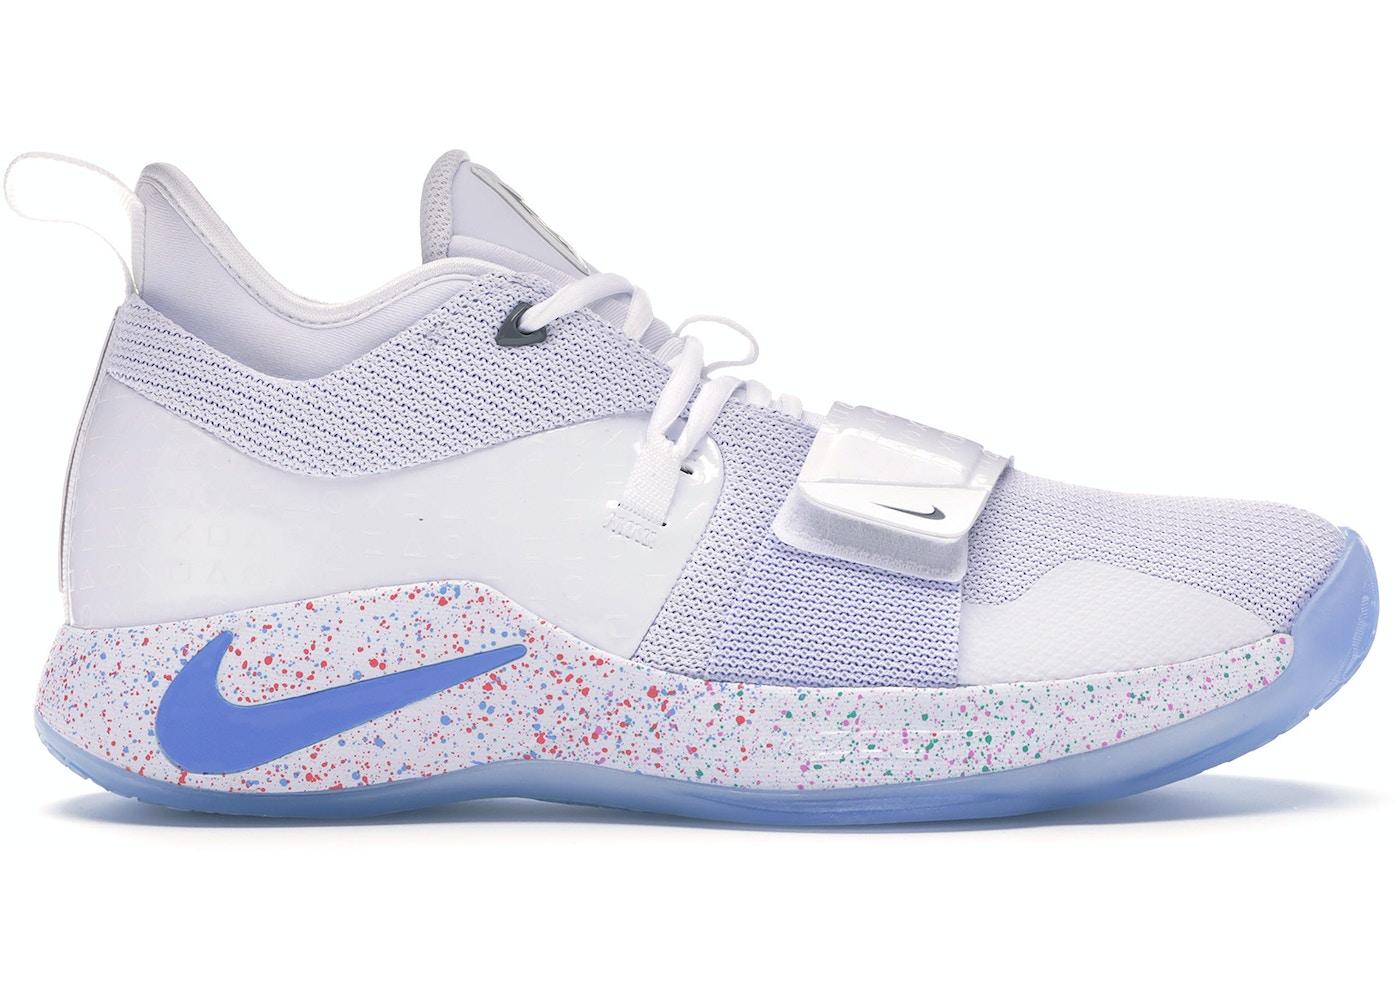 quality design fa026 12738 Nike PG 2.5 Playstation White